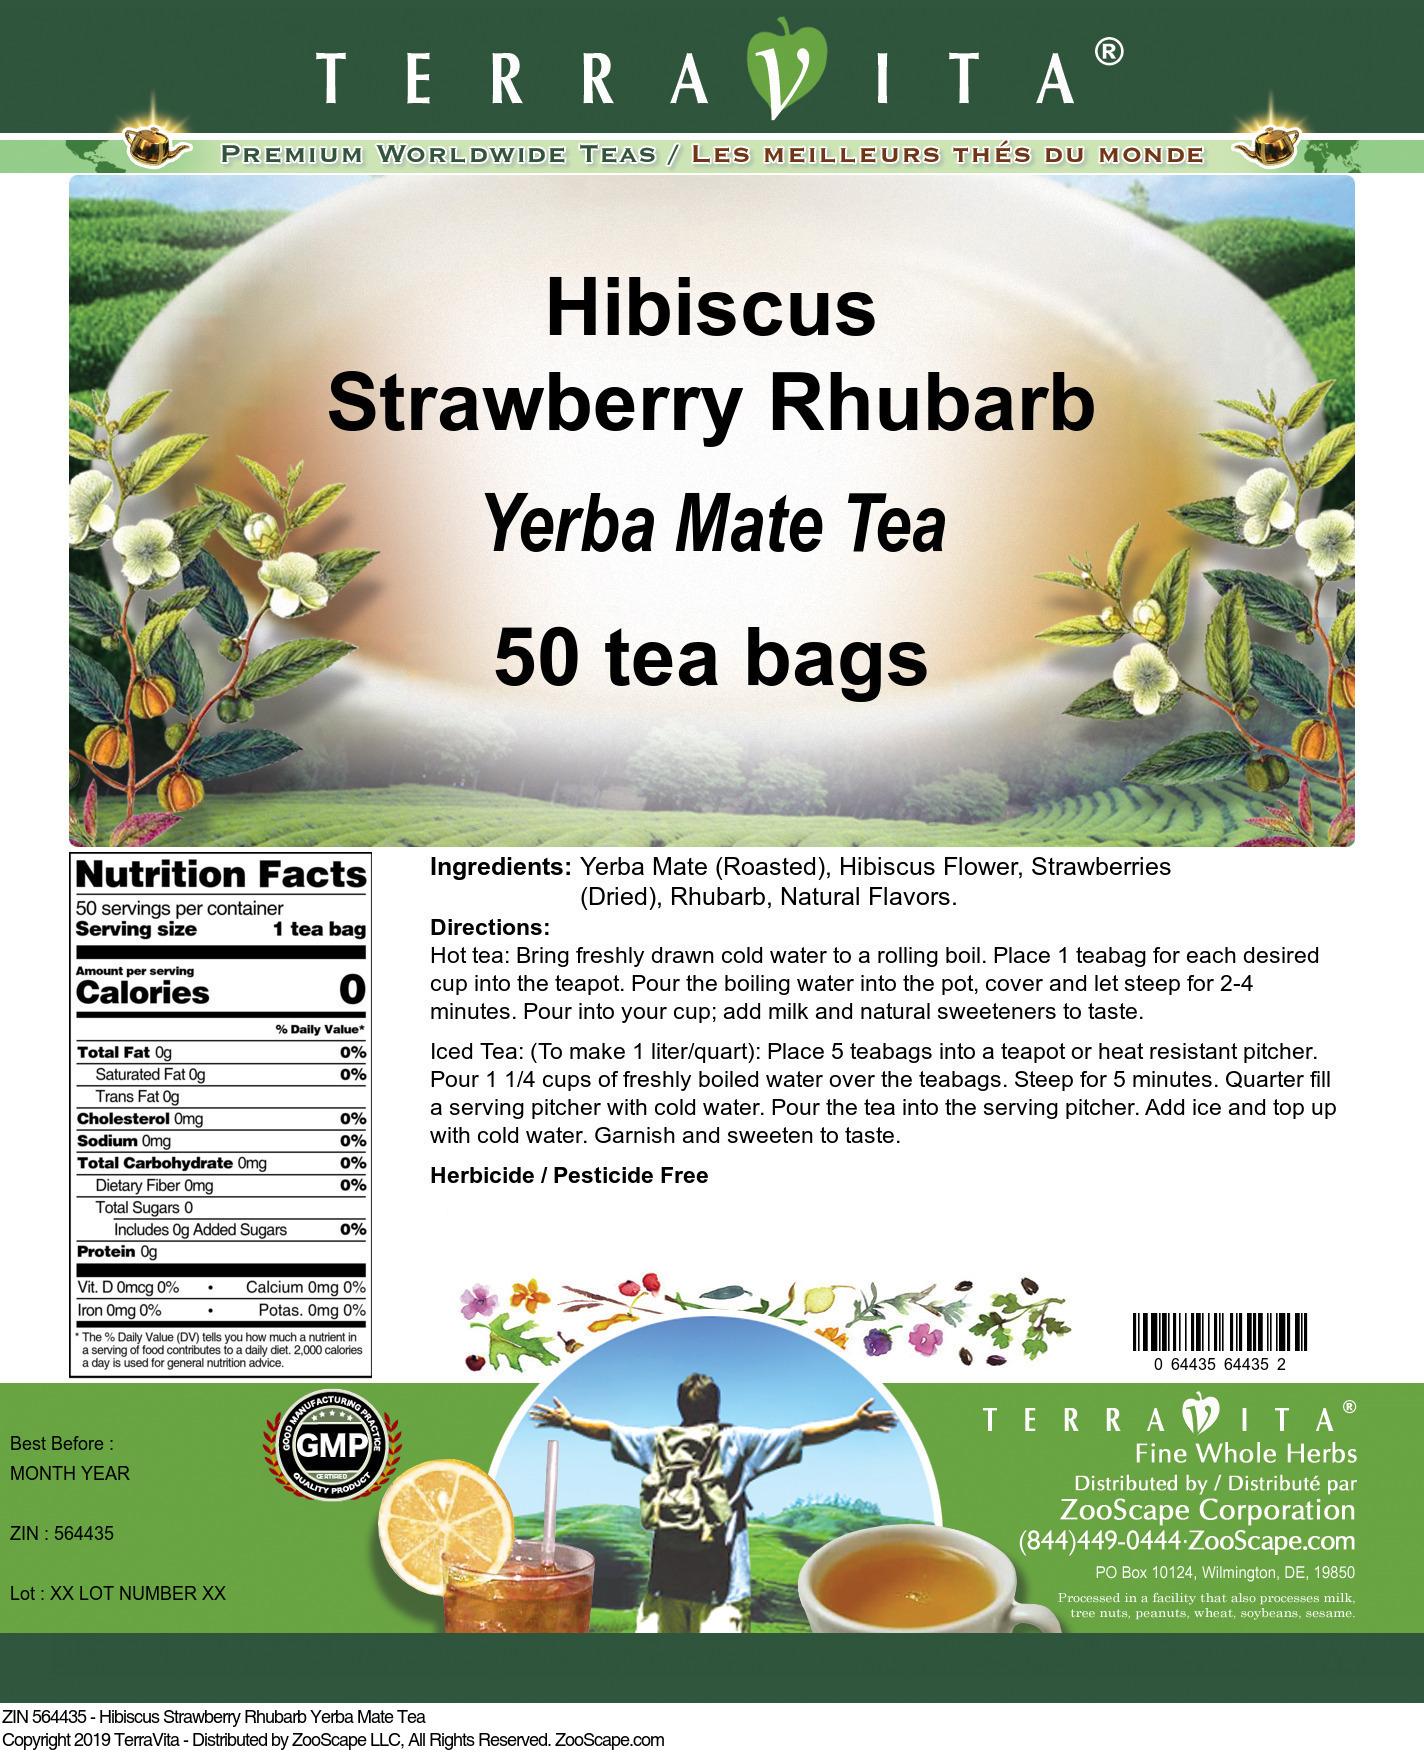 Hibiscus Strawberry Rhubarb Yerba Mate Tea